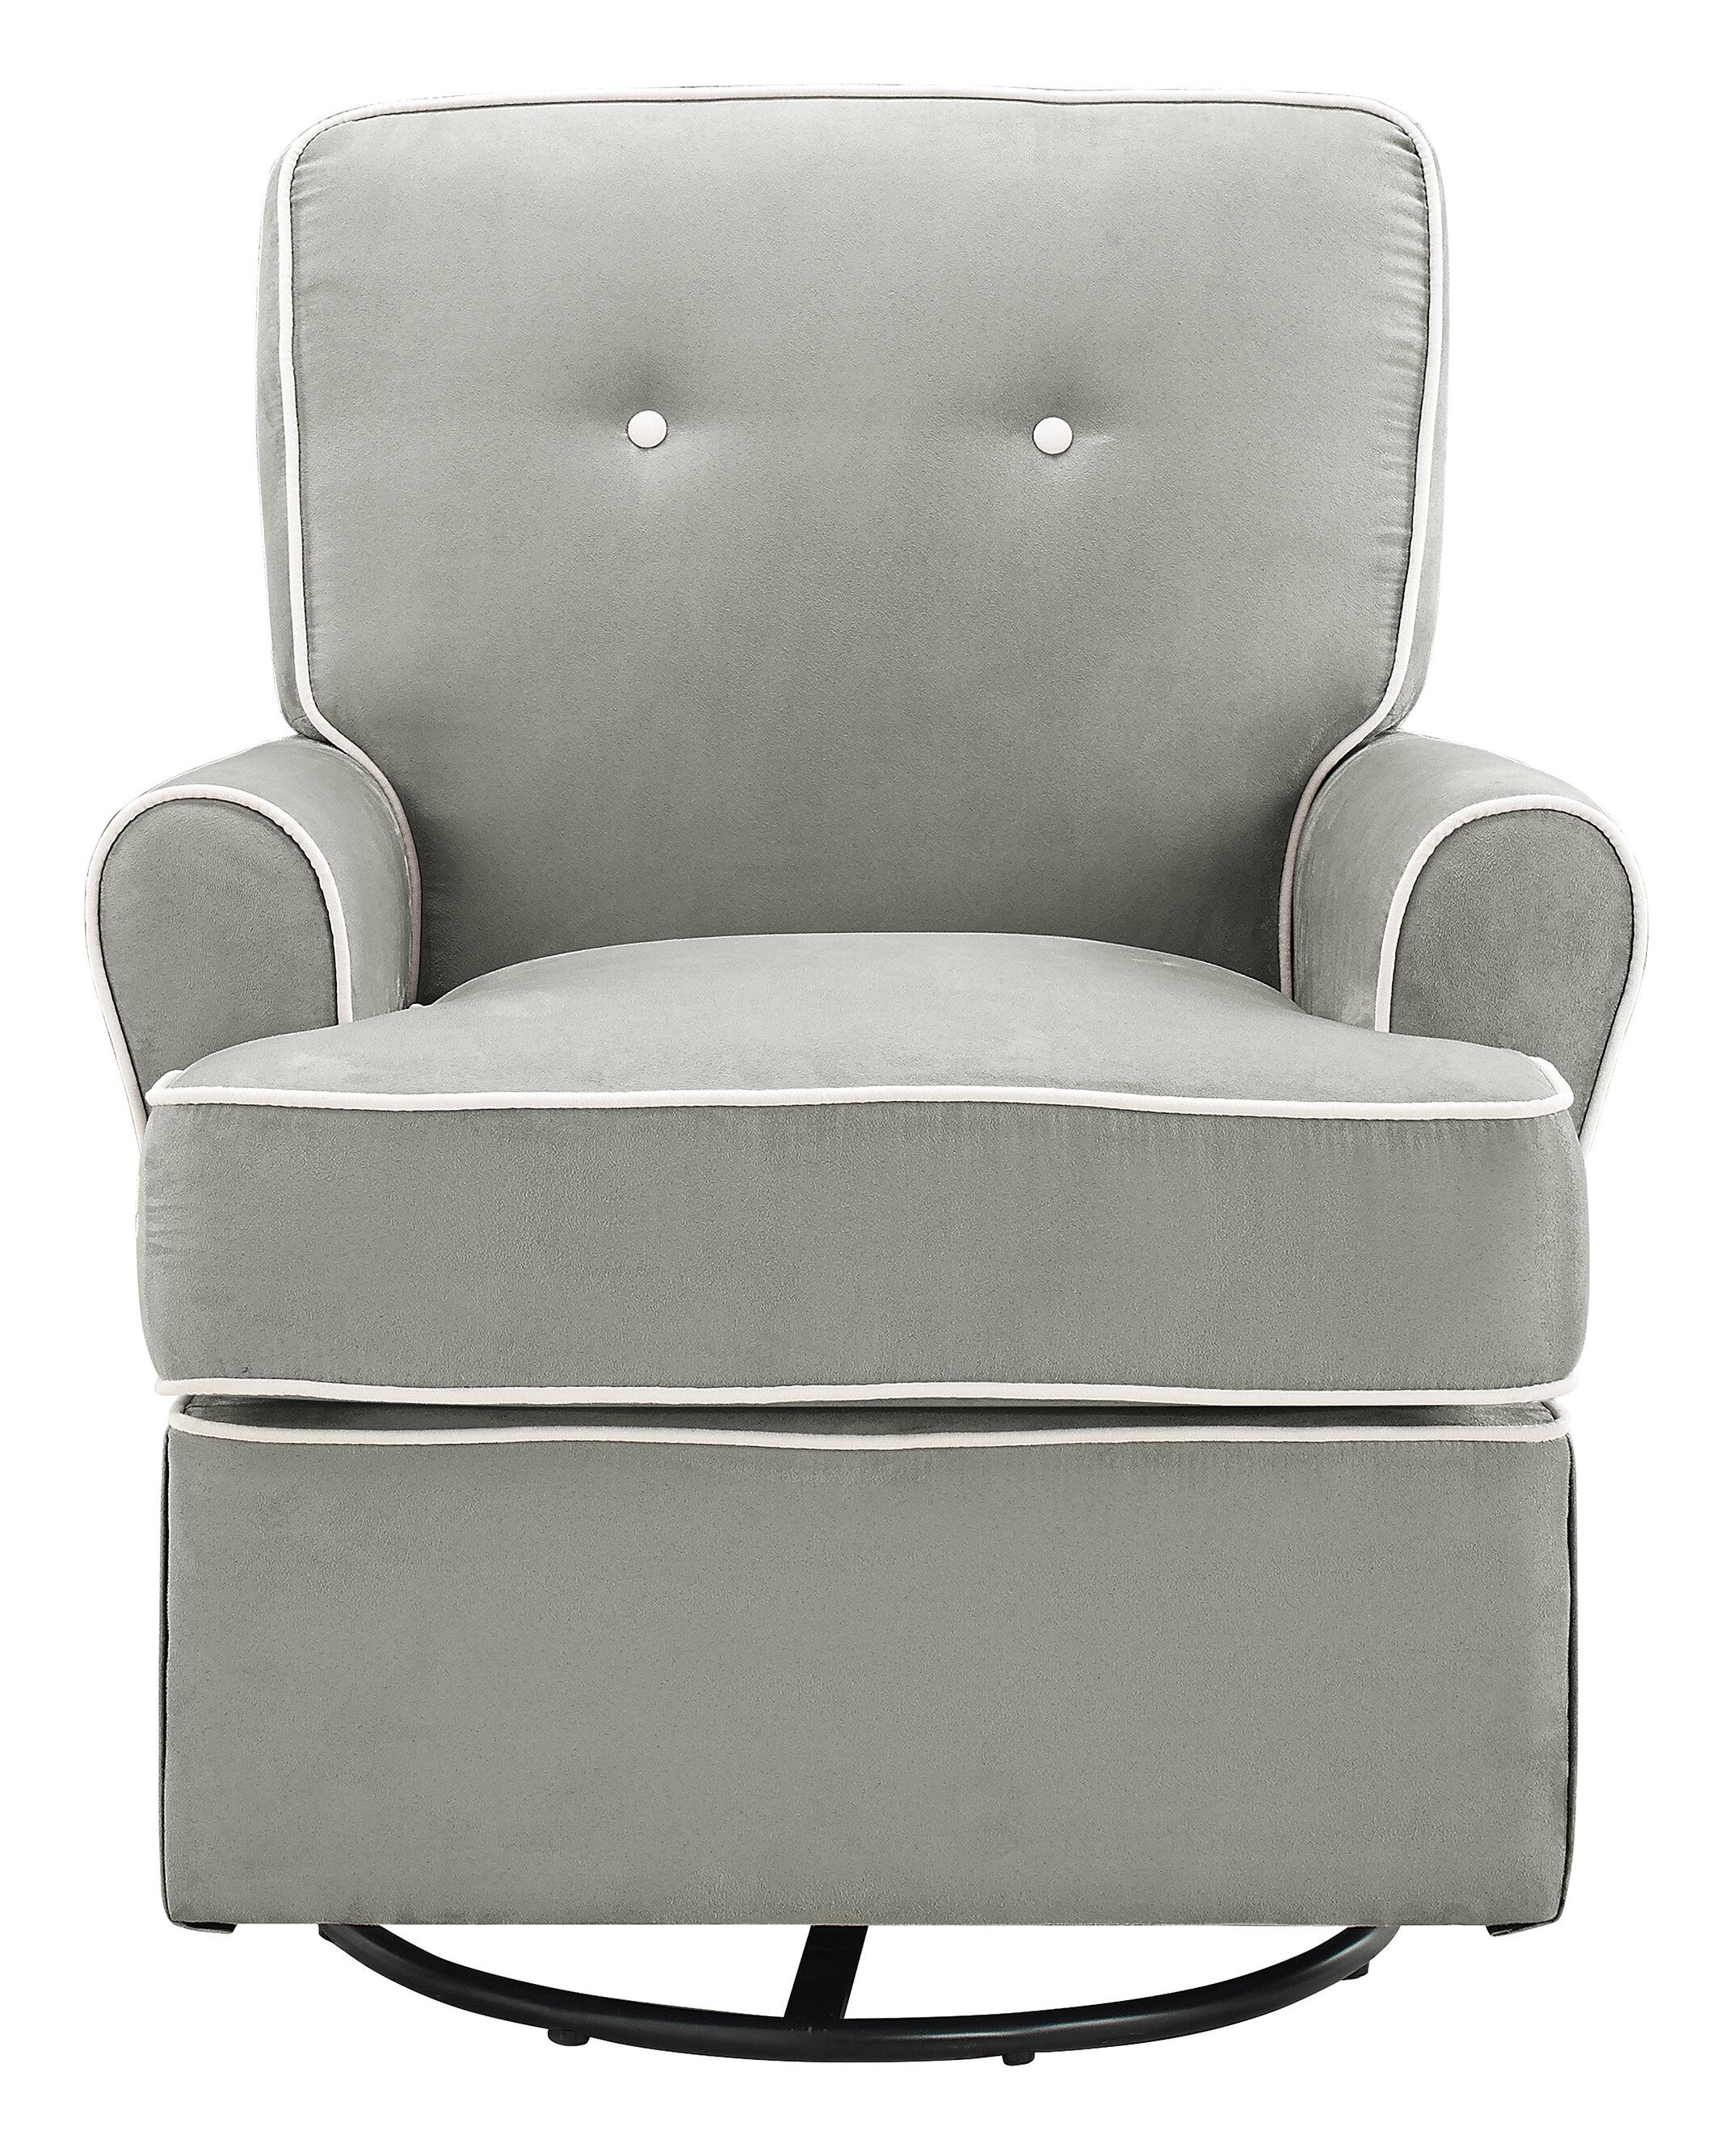 Fabulous Tinsley Swivel Glider Lamtechconsult Wood Chair Design Ideas Lamtechconsultcom